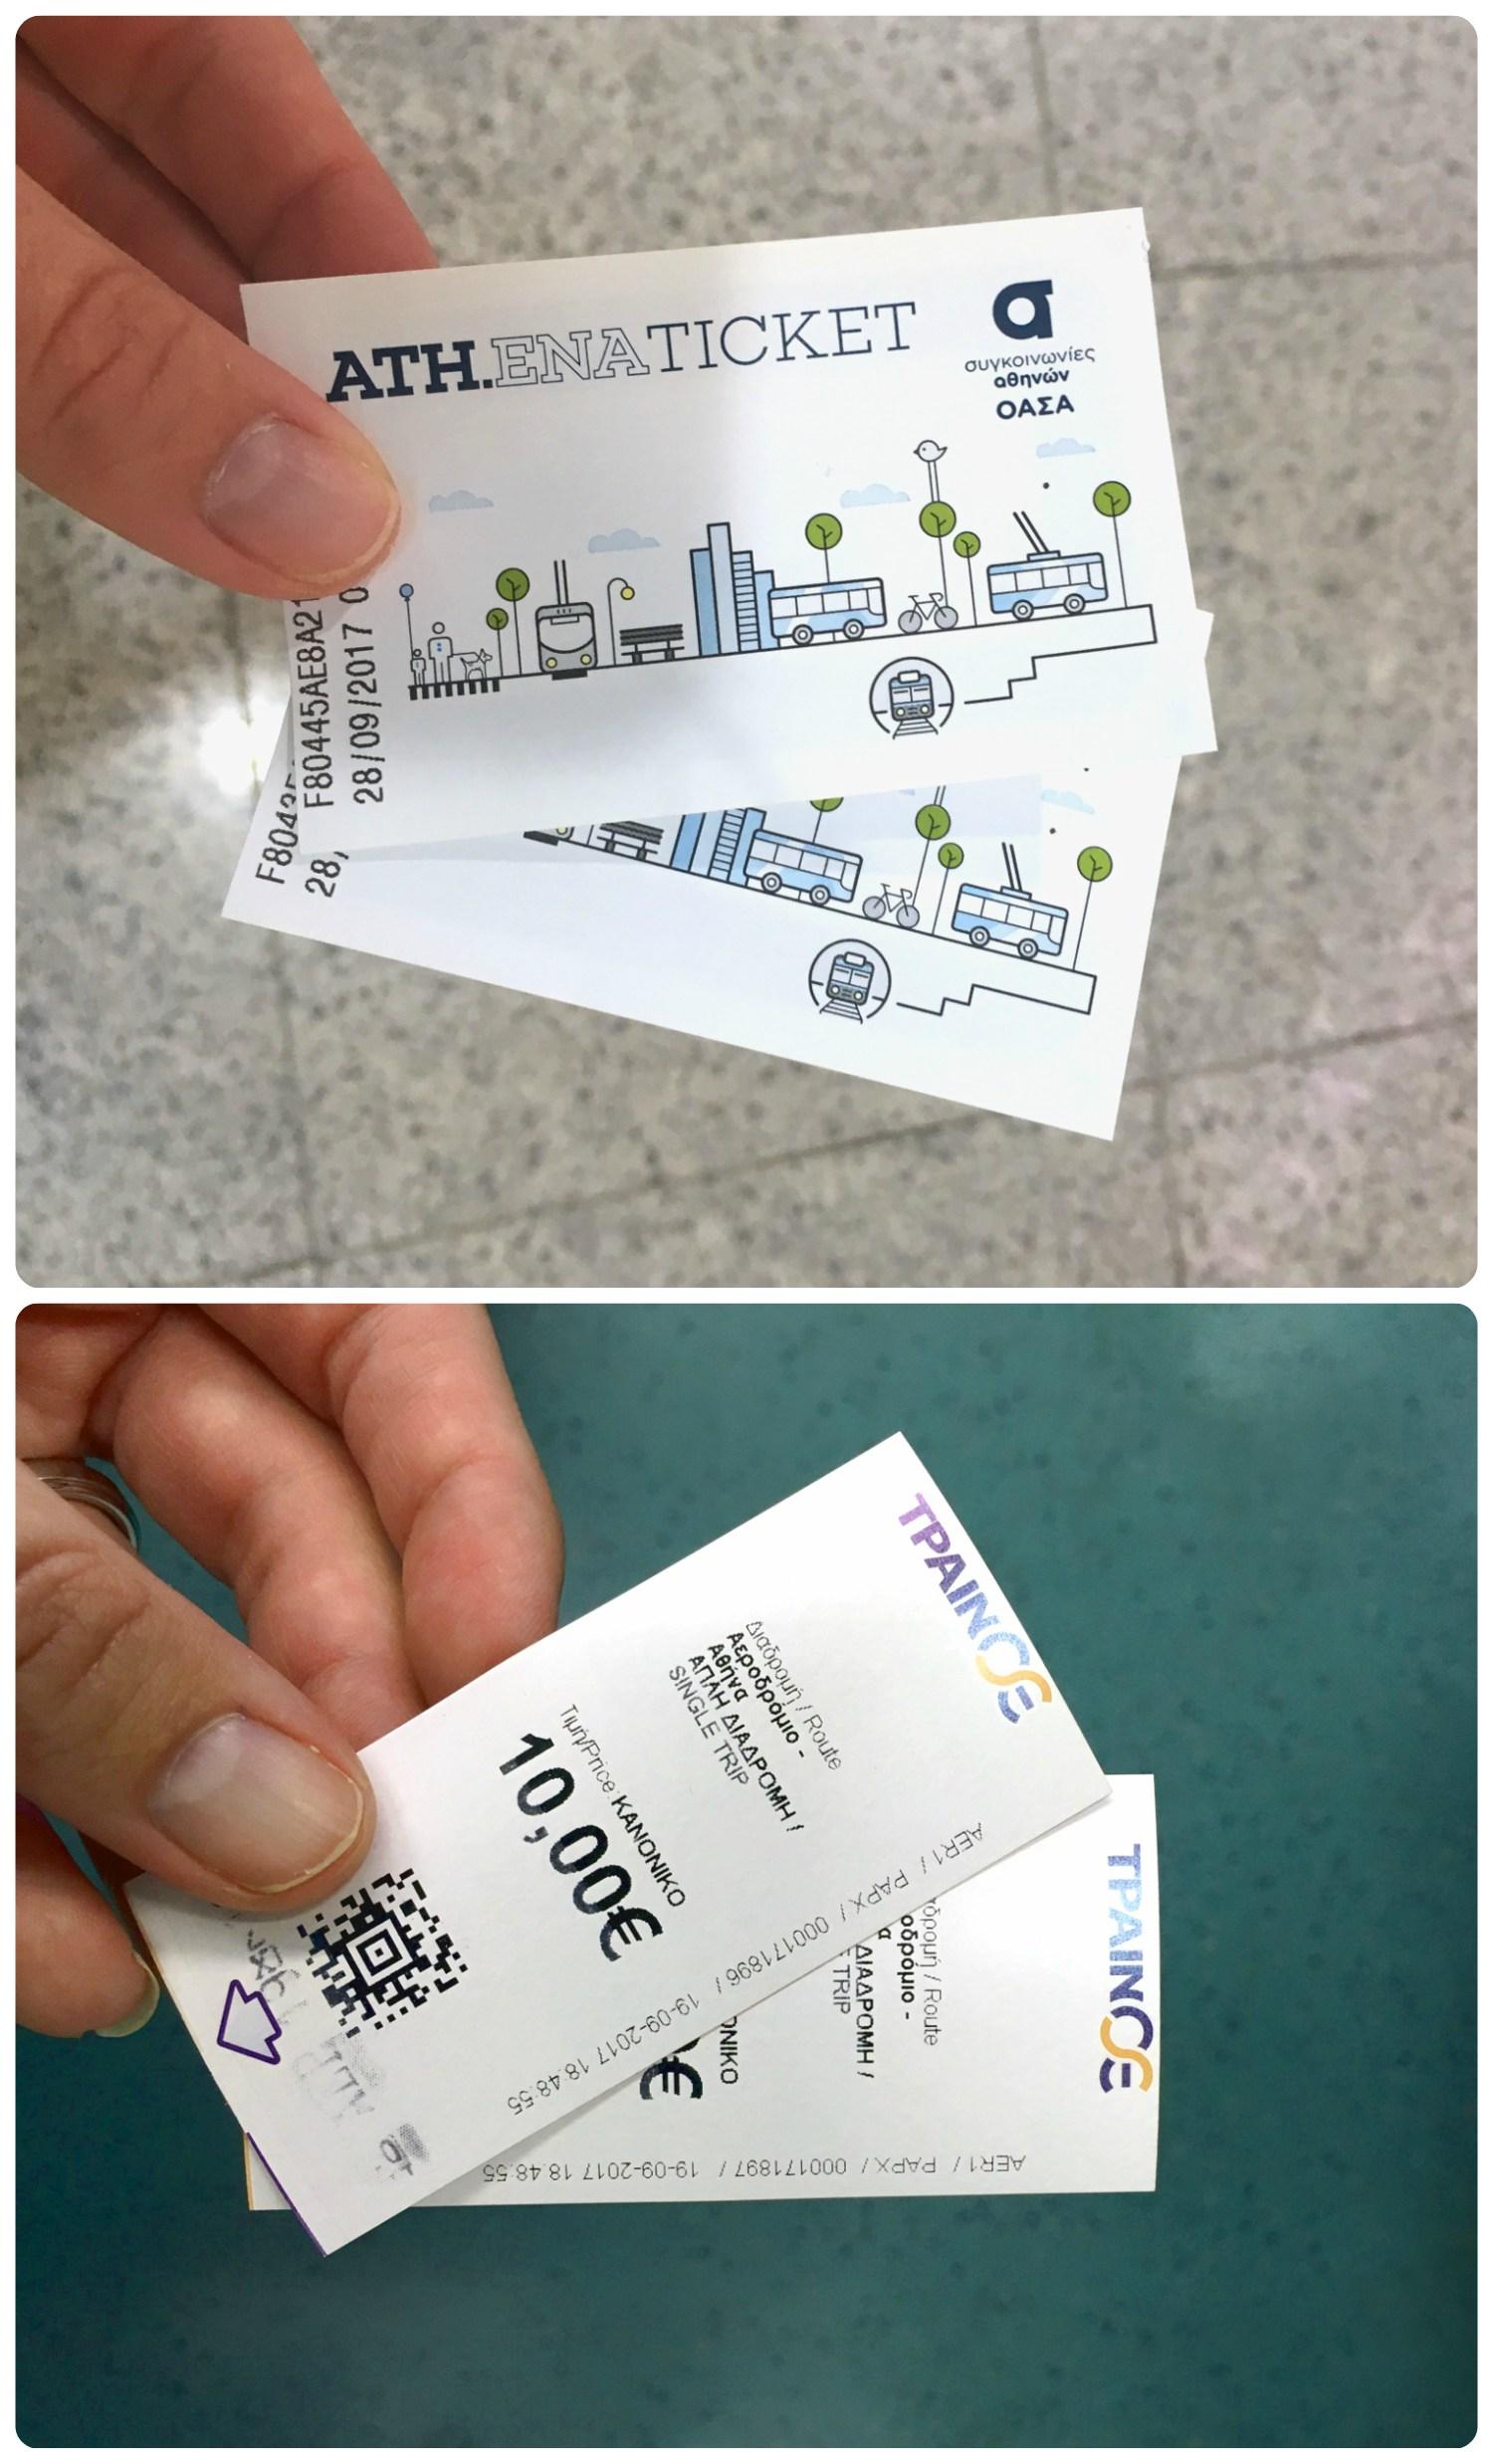 Athens public transportation tickets.